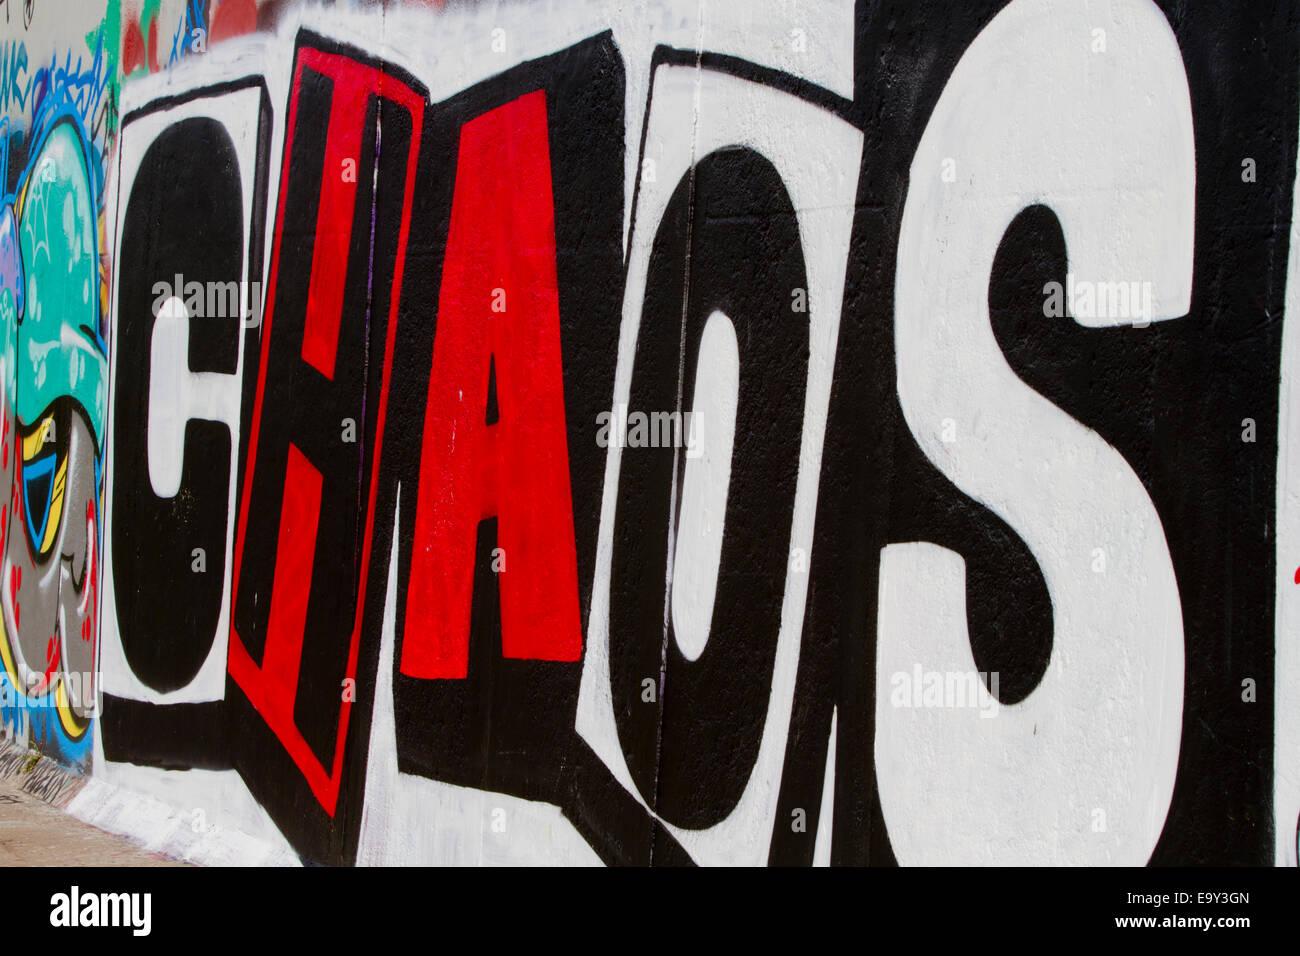 Chaos Berlin Wall Graffiti Block Letters Red White